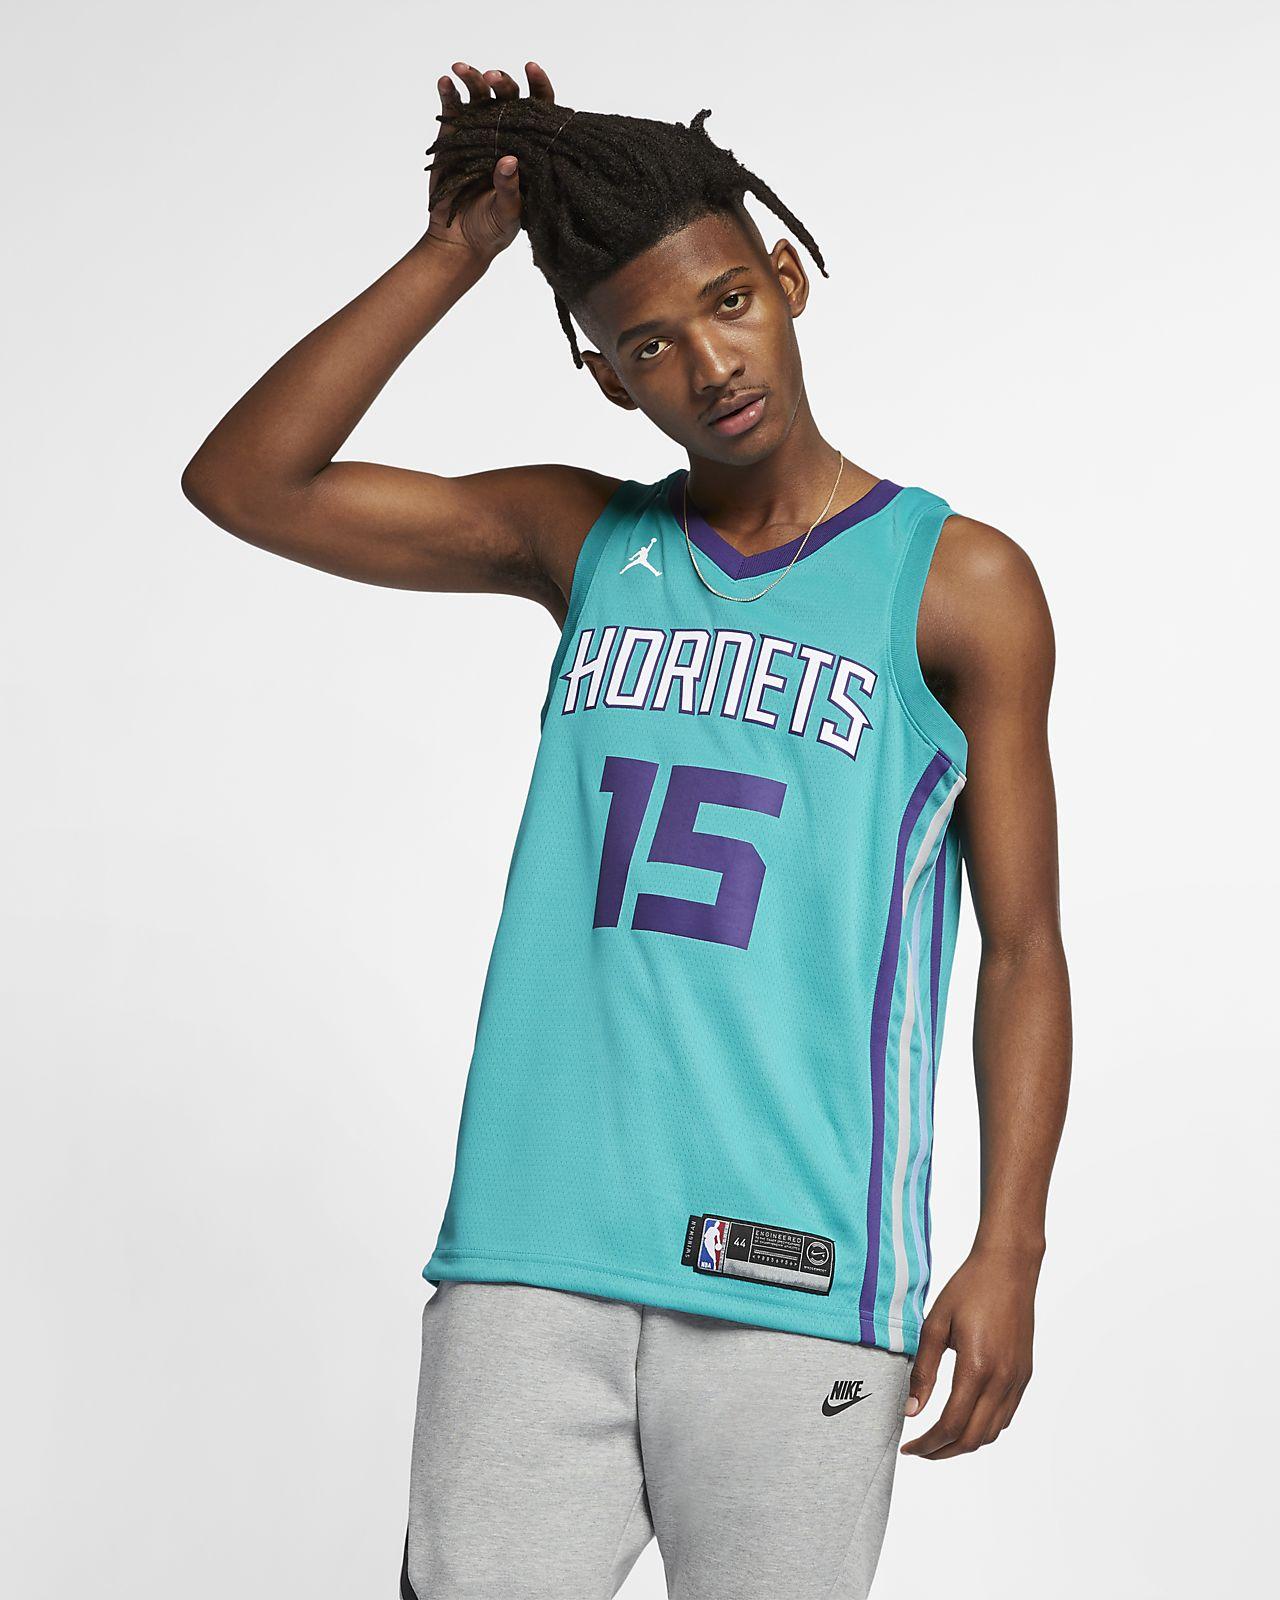 夏洛特黄蜂队 (Kemba Walker) Icon Edition Swingman Jersey Jordan NBA Connected Jersey 男子球衣